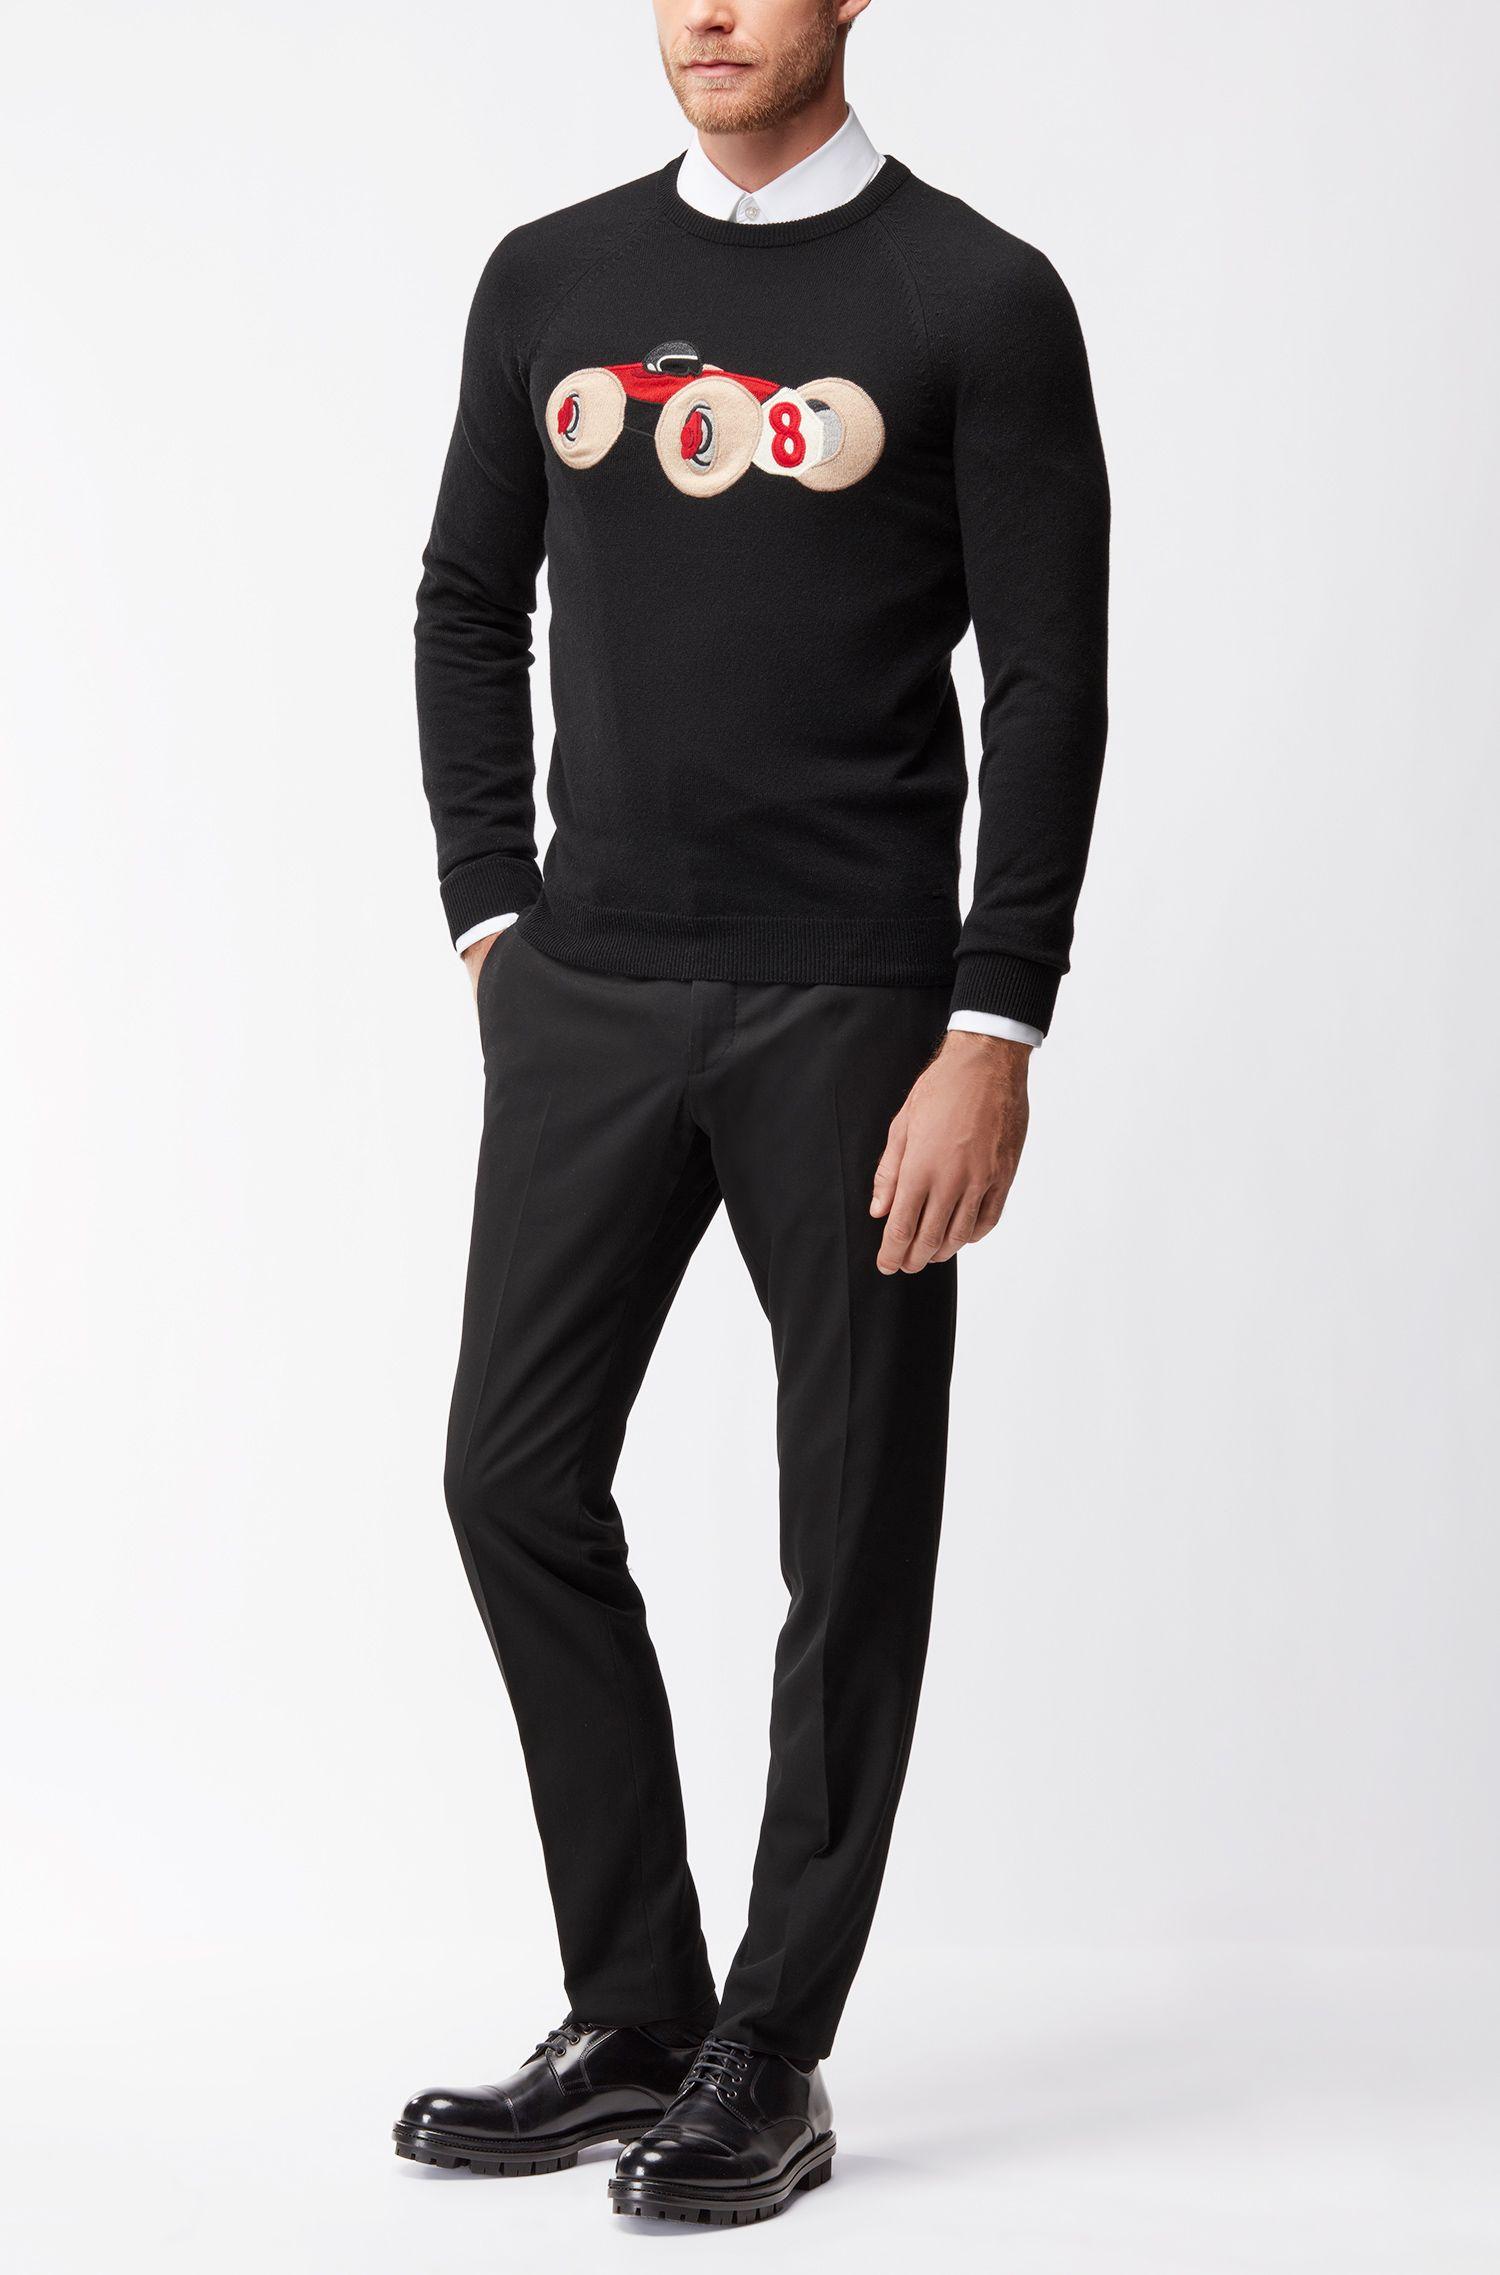 Wool-blend sweater with intarsia race car motif